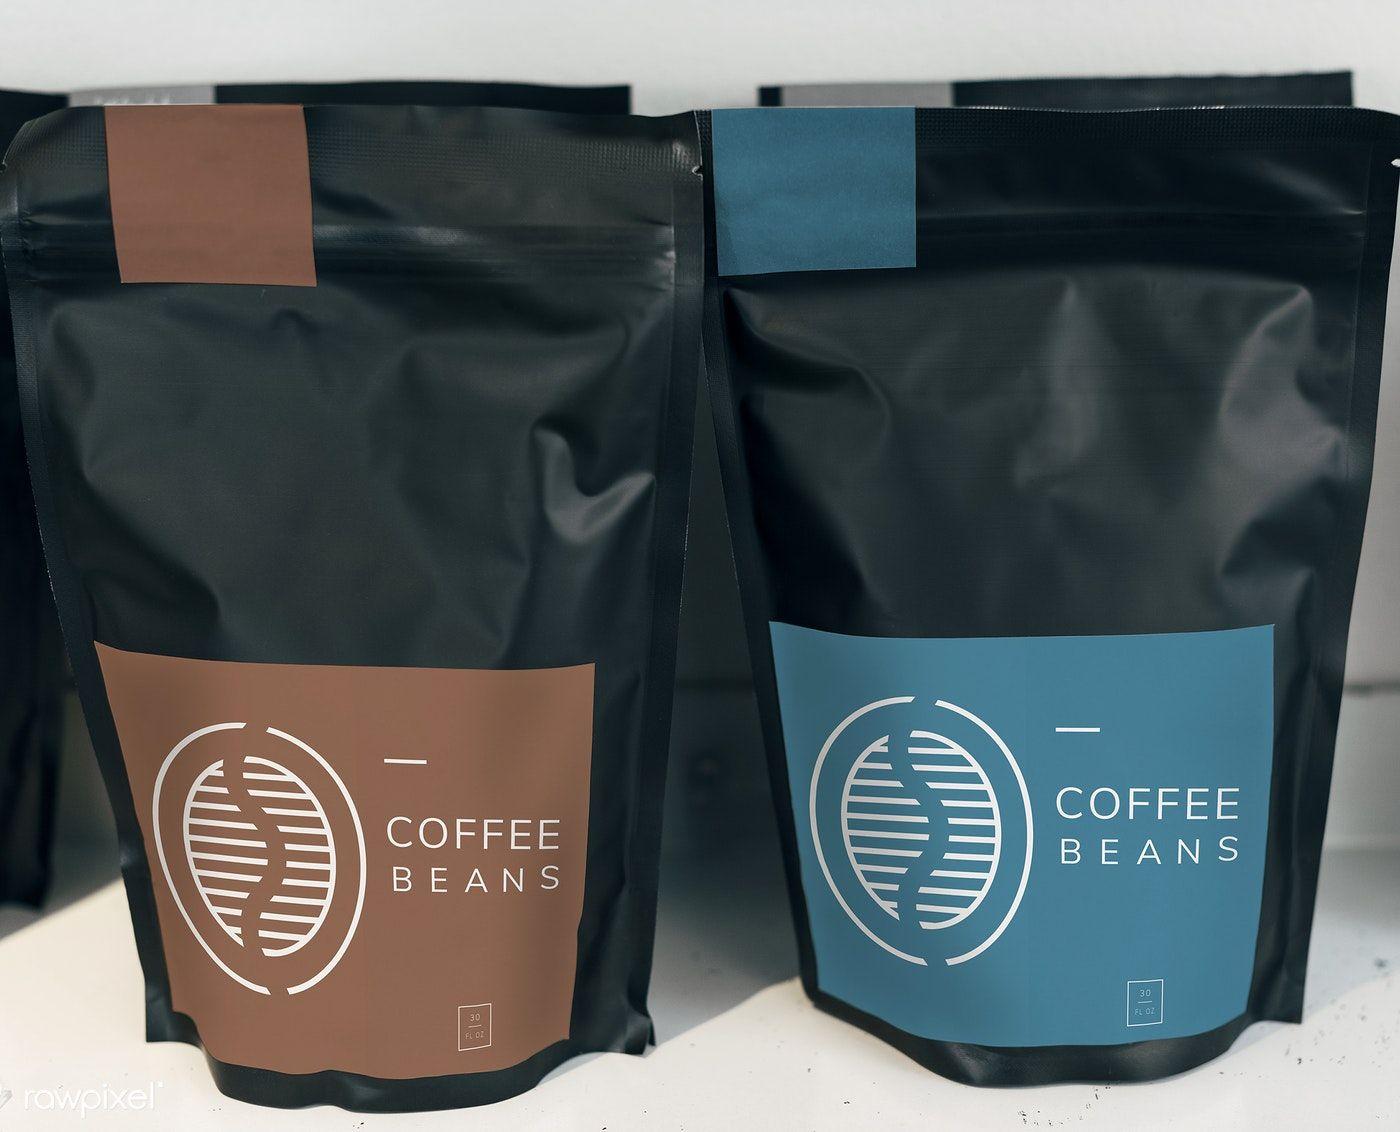 Coffee Bean Bag Mockup Design Free Image By Rawpixel Com Coffee Bean Bags Bag Mockup Coffee Beans